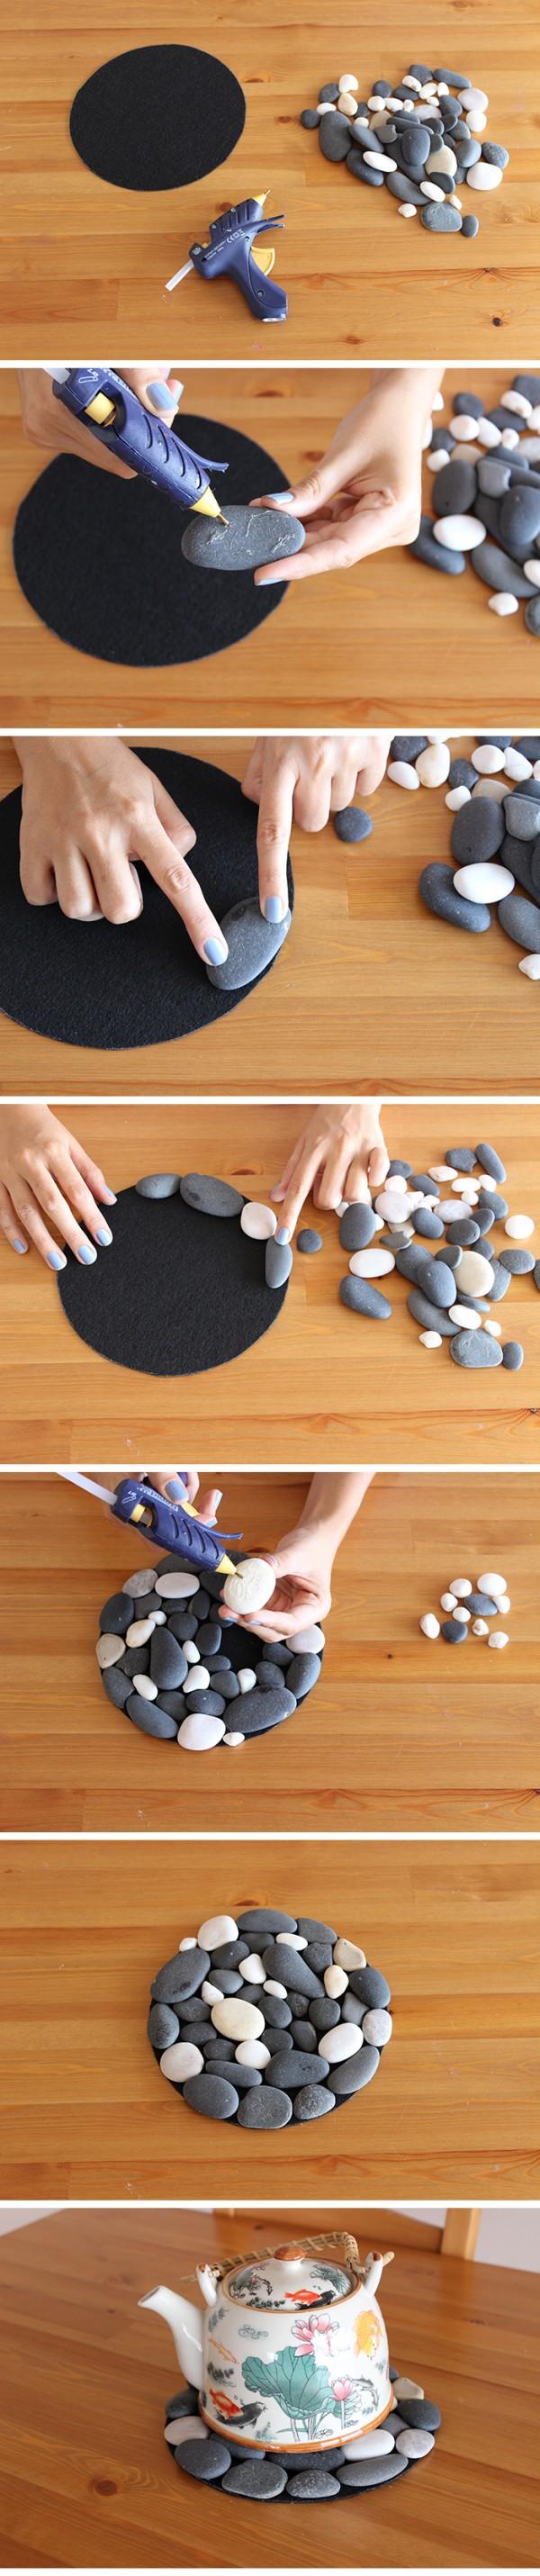 2. DIY Pot Holder